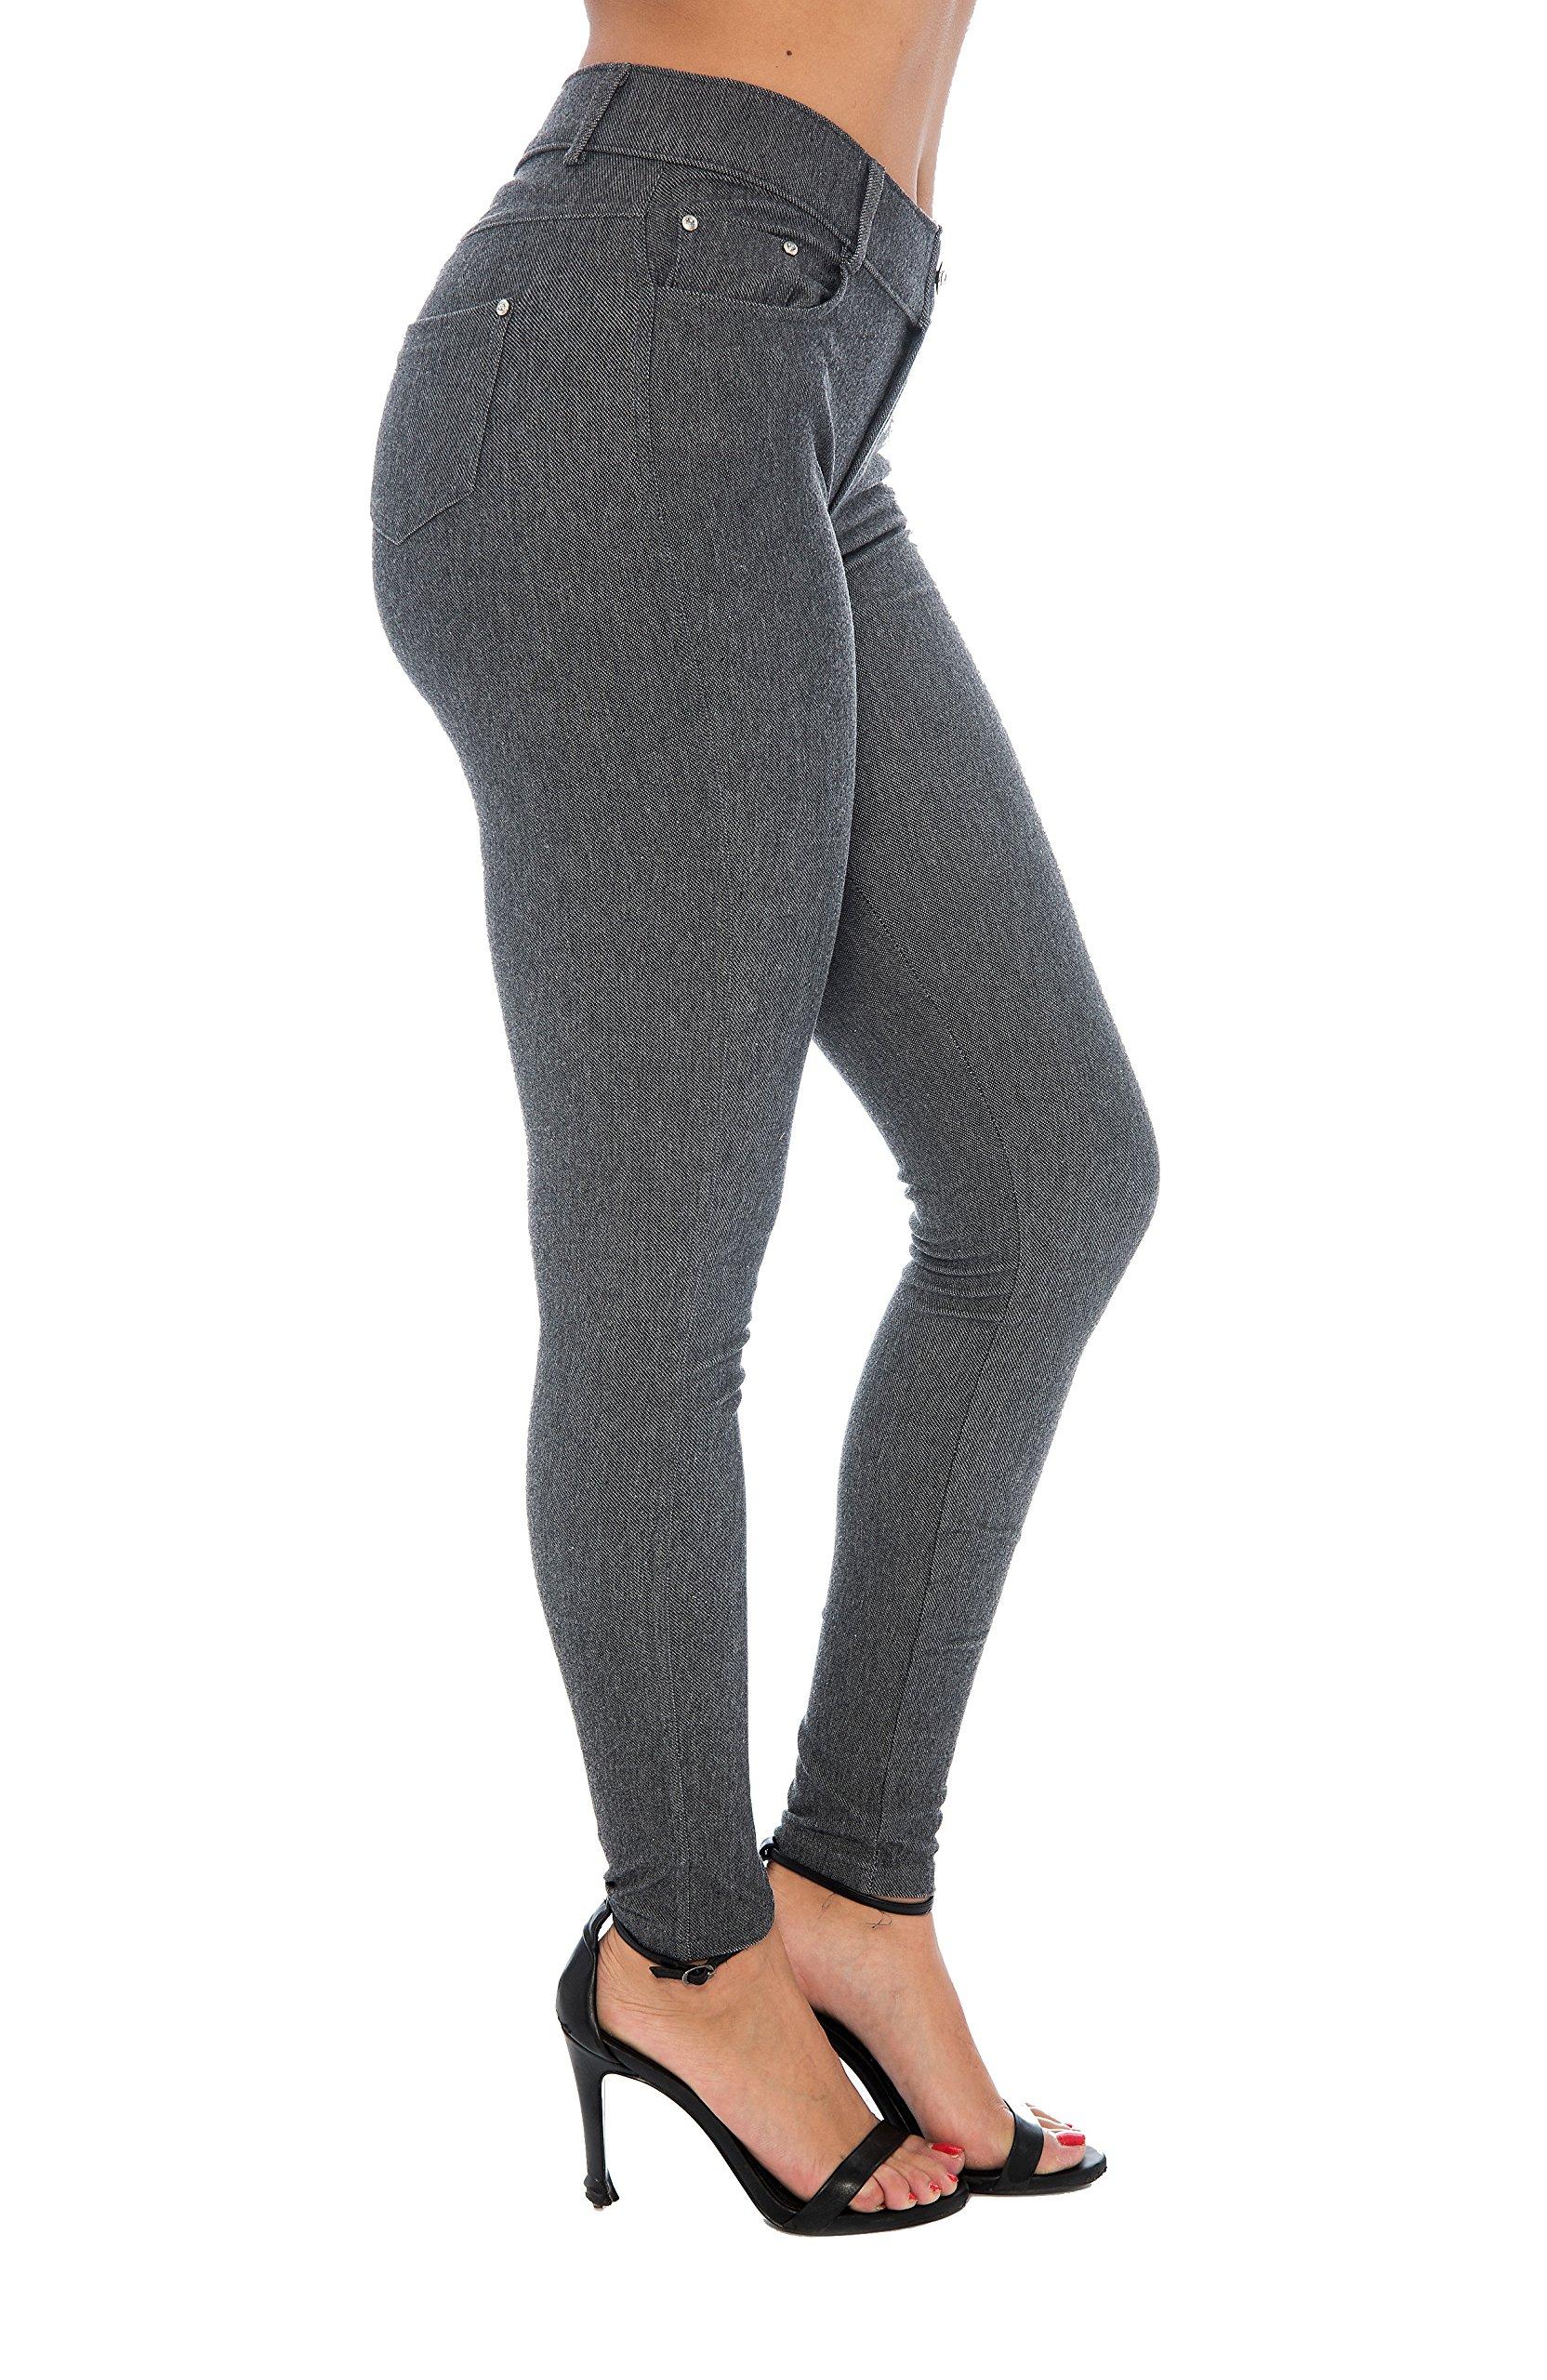 Women's Basic Jeggings Leggings Stretchy 5 Pockets Pants Regular Plus Sizes, Grey, Medium